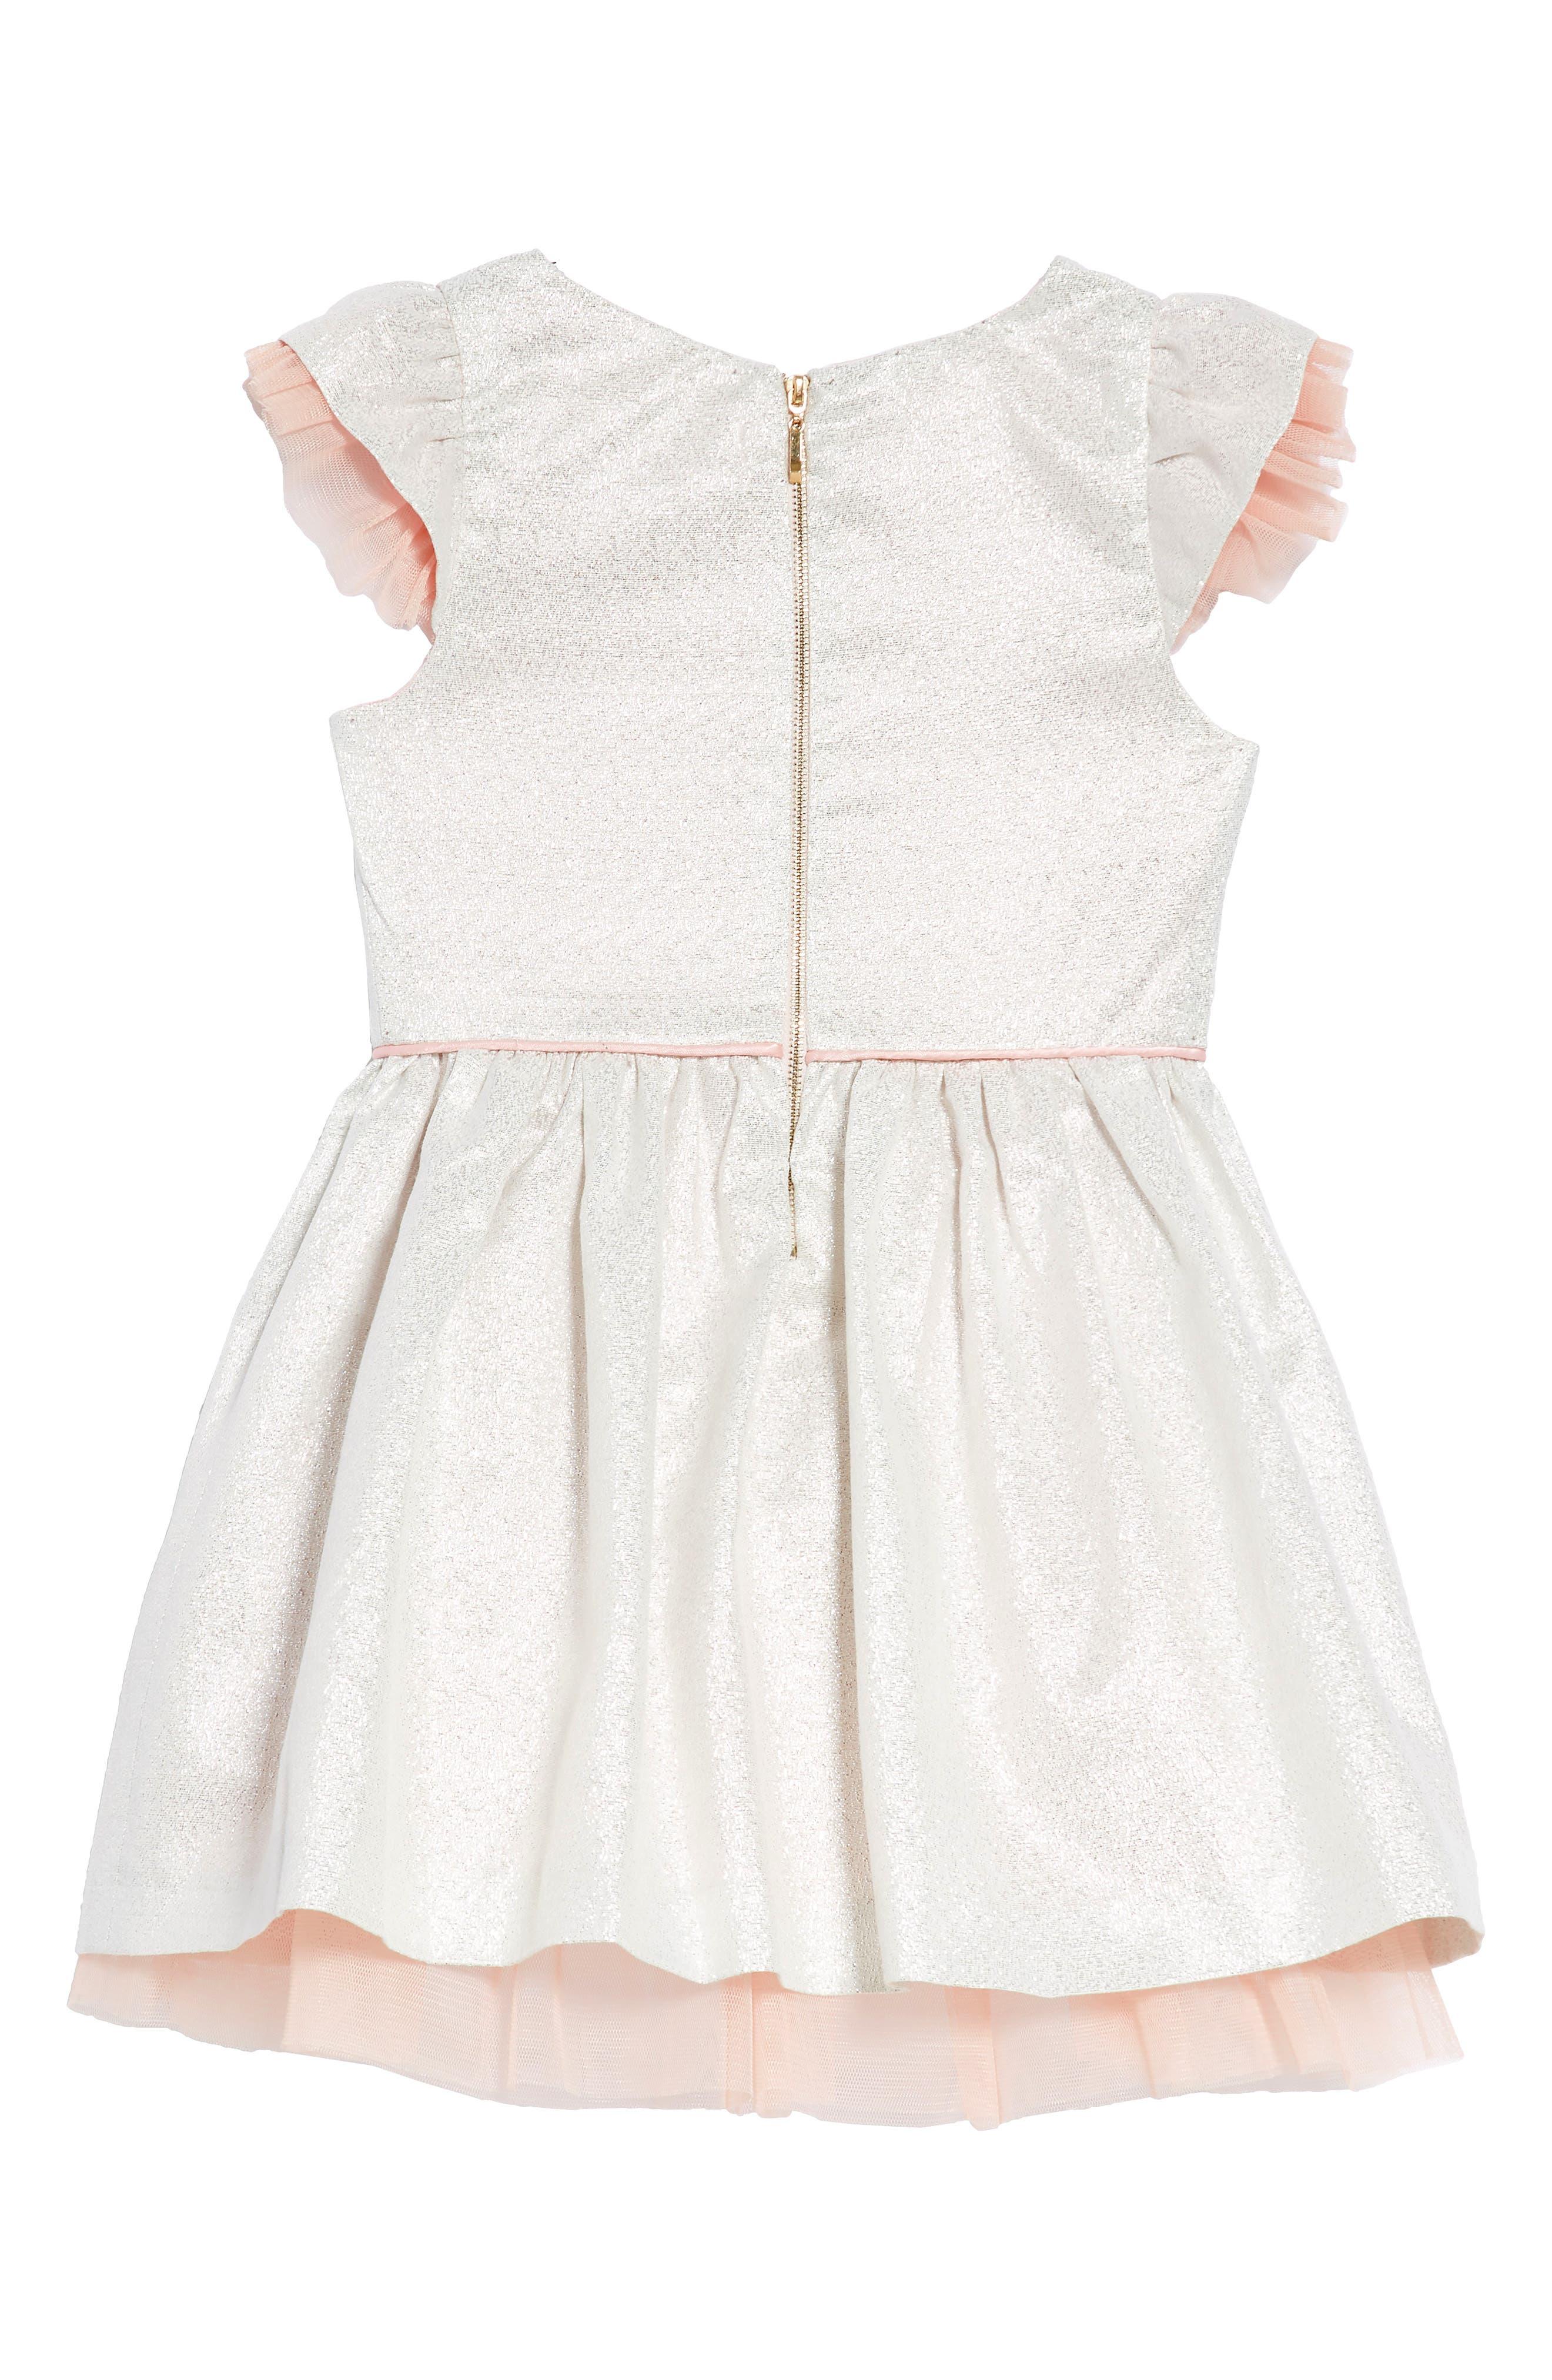 Embellished Fit & Flare Dress,                             Alternate thumbnail 2, color,                             Silver